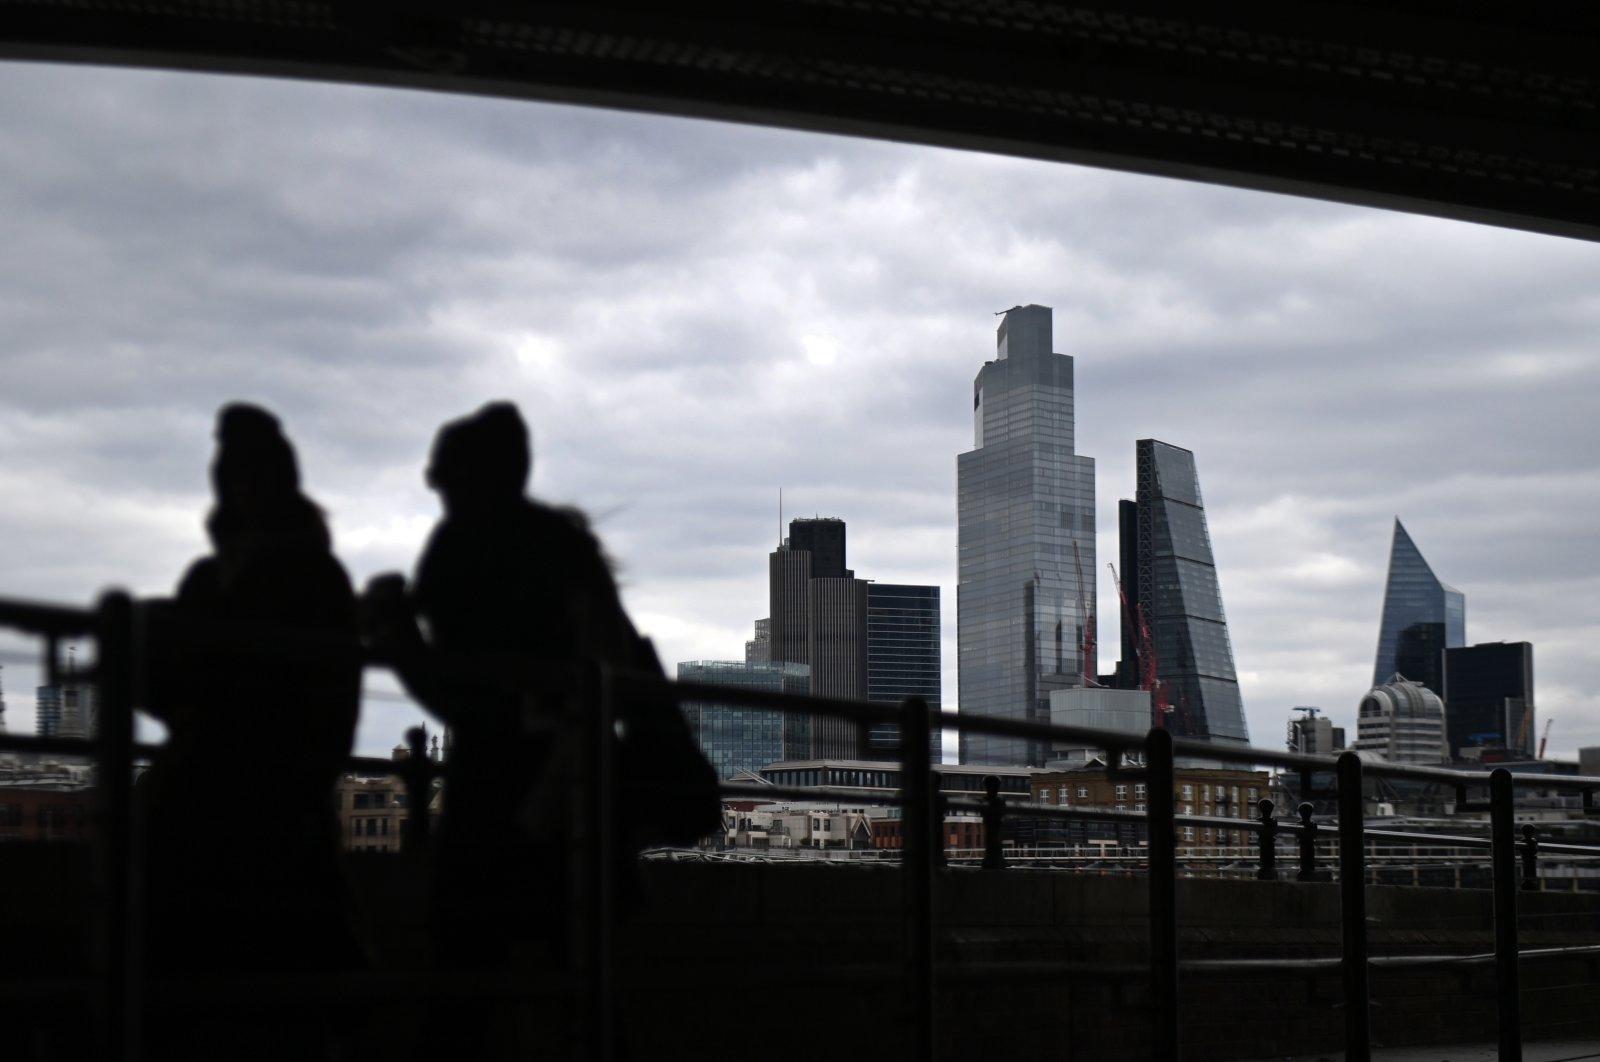 London's financial district, the City of London, London, Britain, April 7, 2021. (EPA Photo)